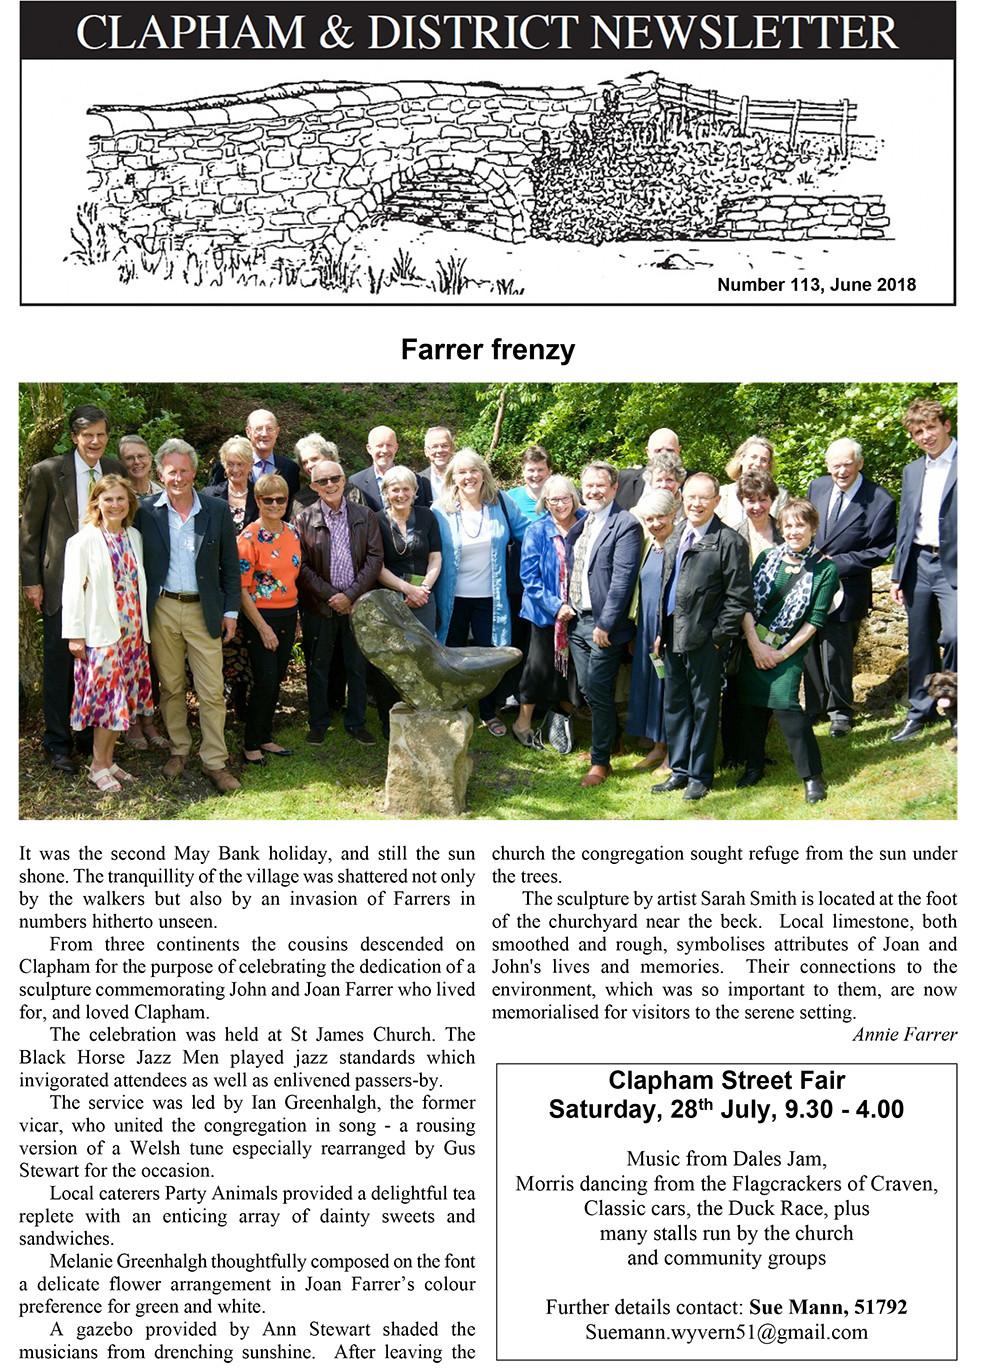 clapham-newsletter-113-june-2018-1